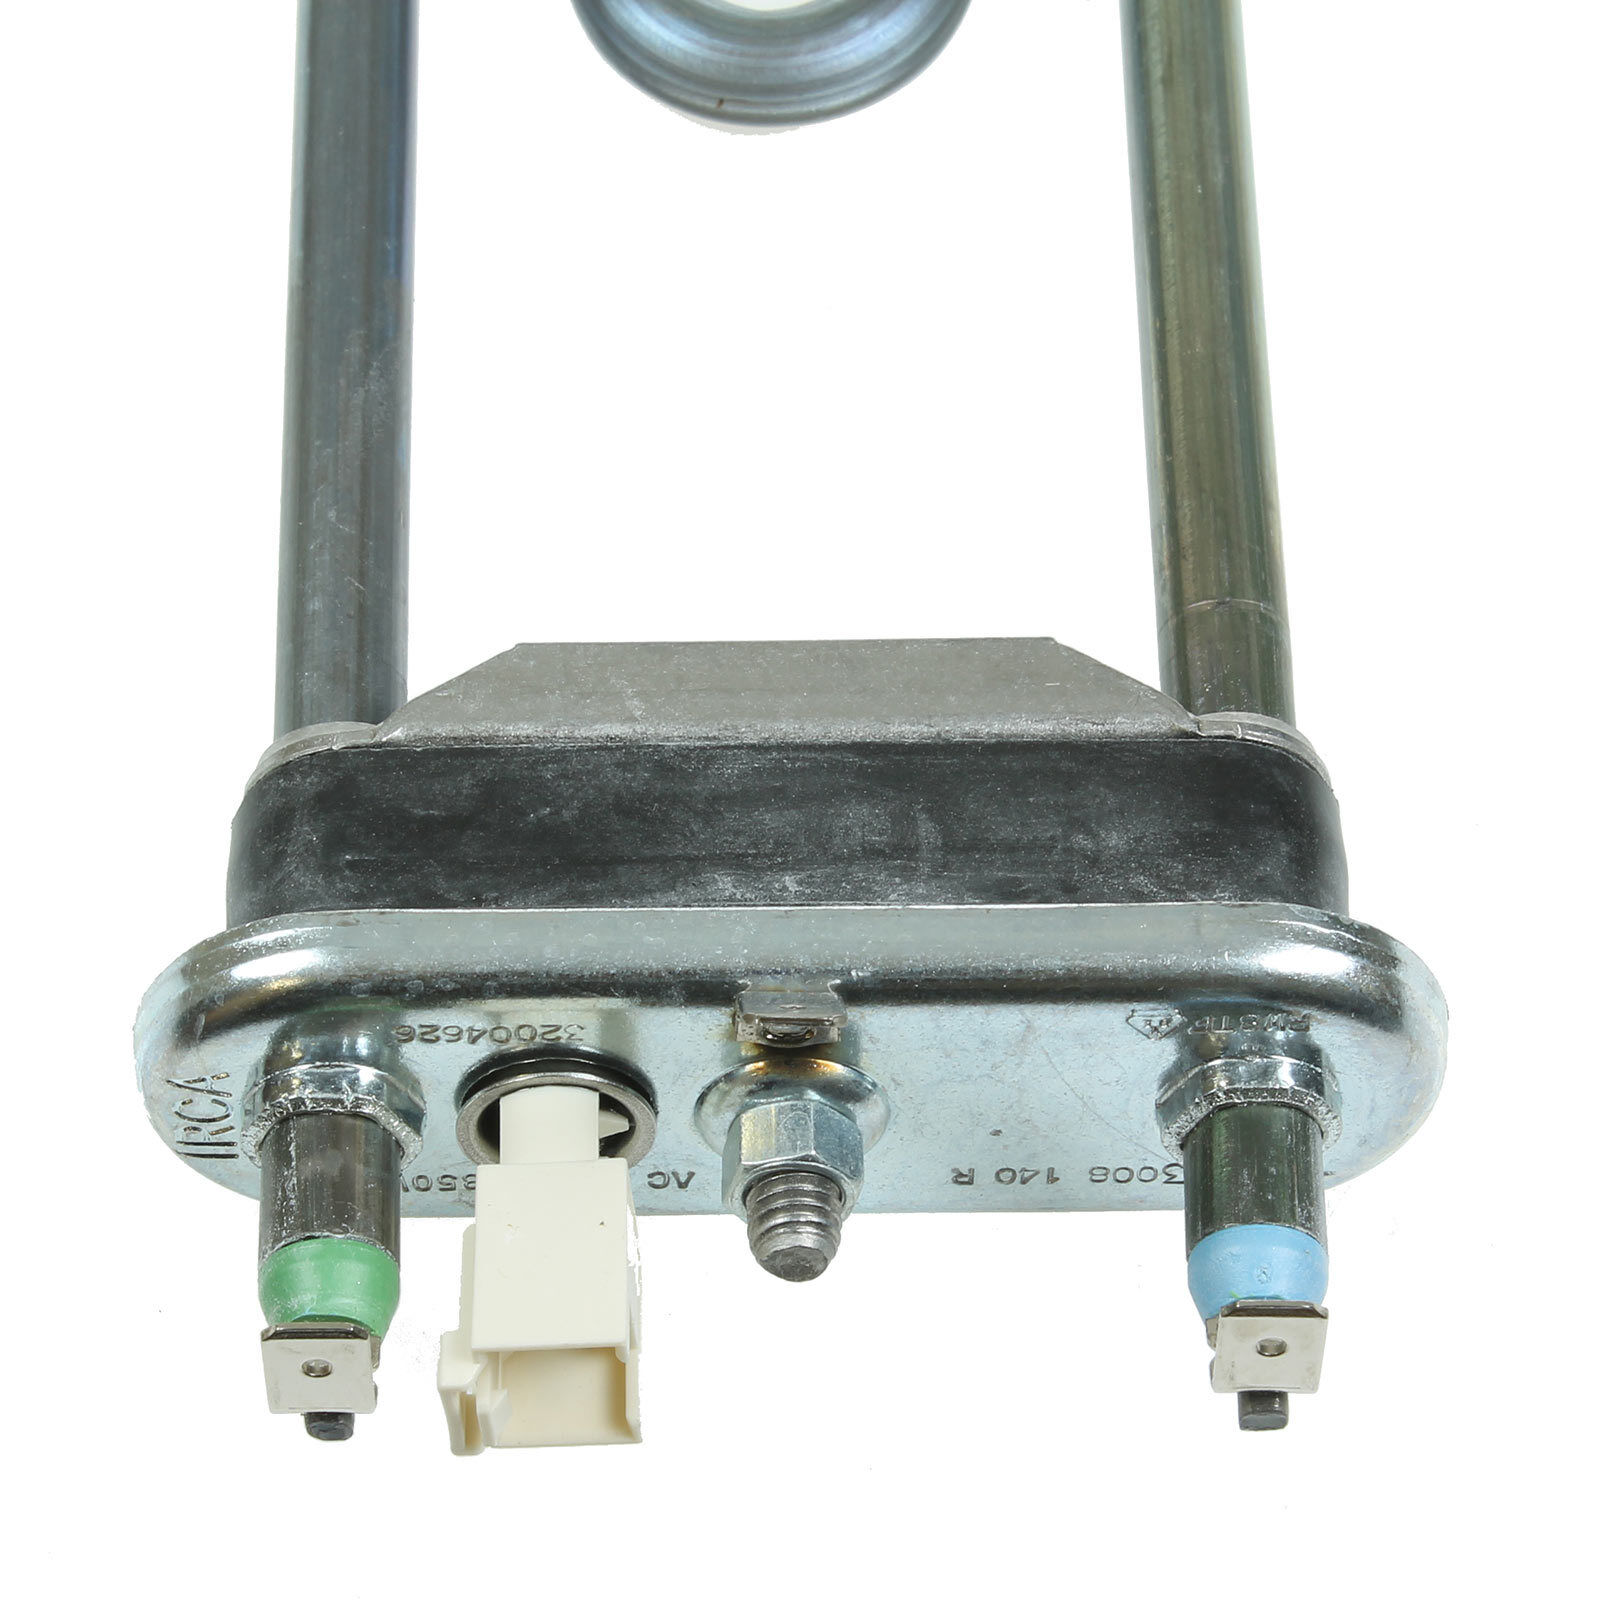 Genuine Part Number 41028717 Hoover Lavatrice Elemento riscaldatore